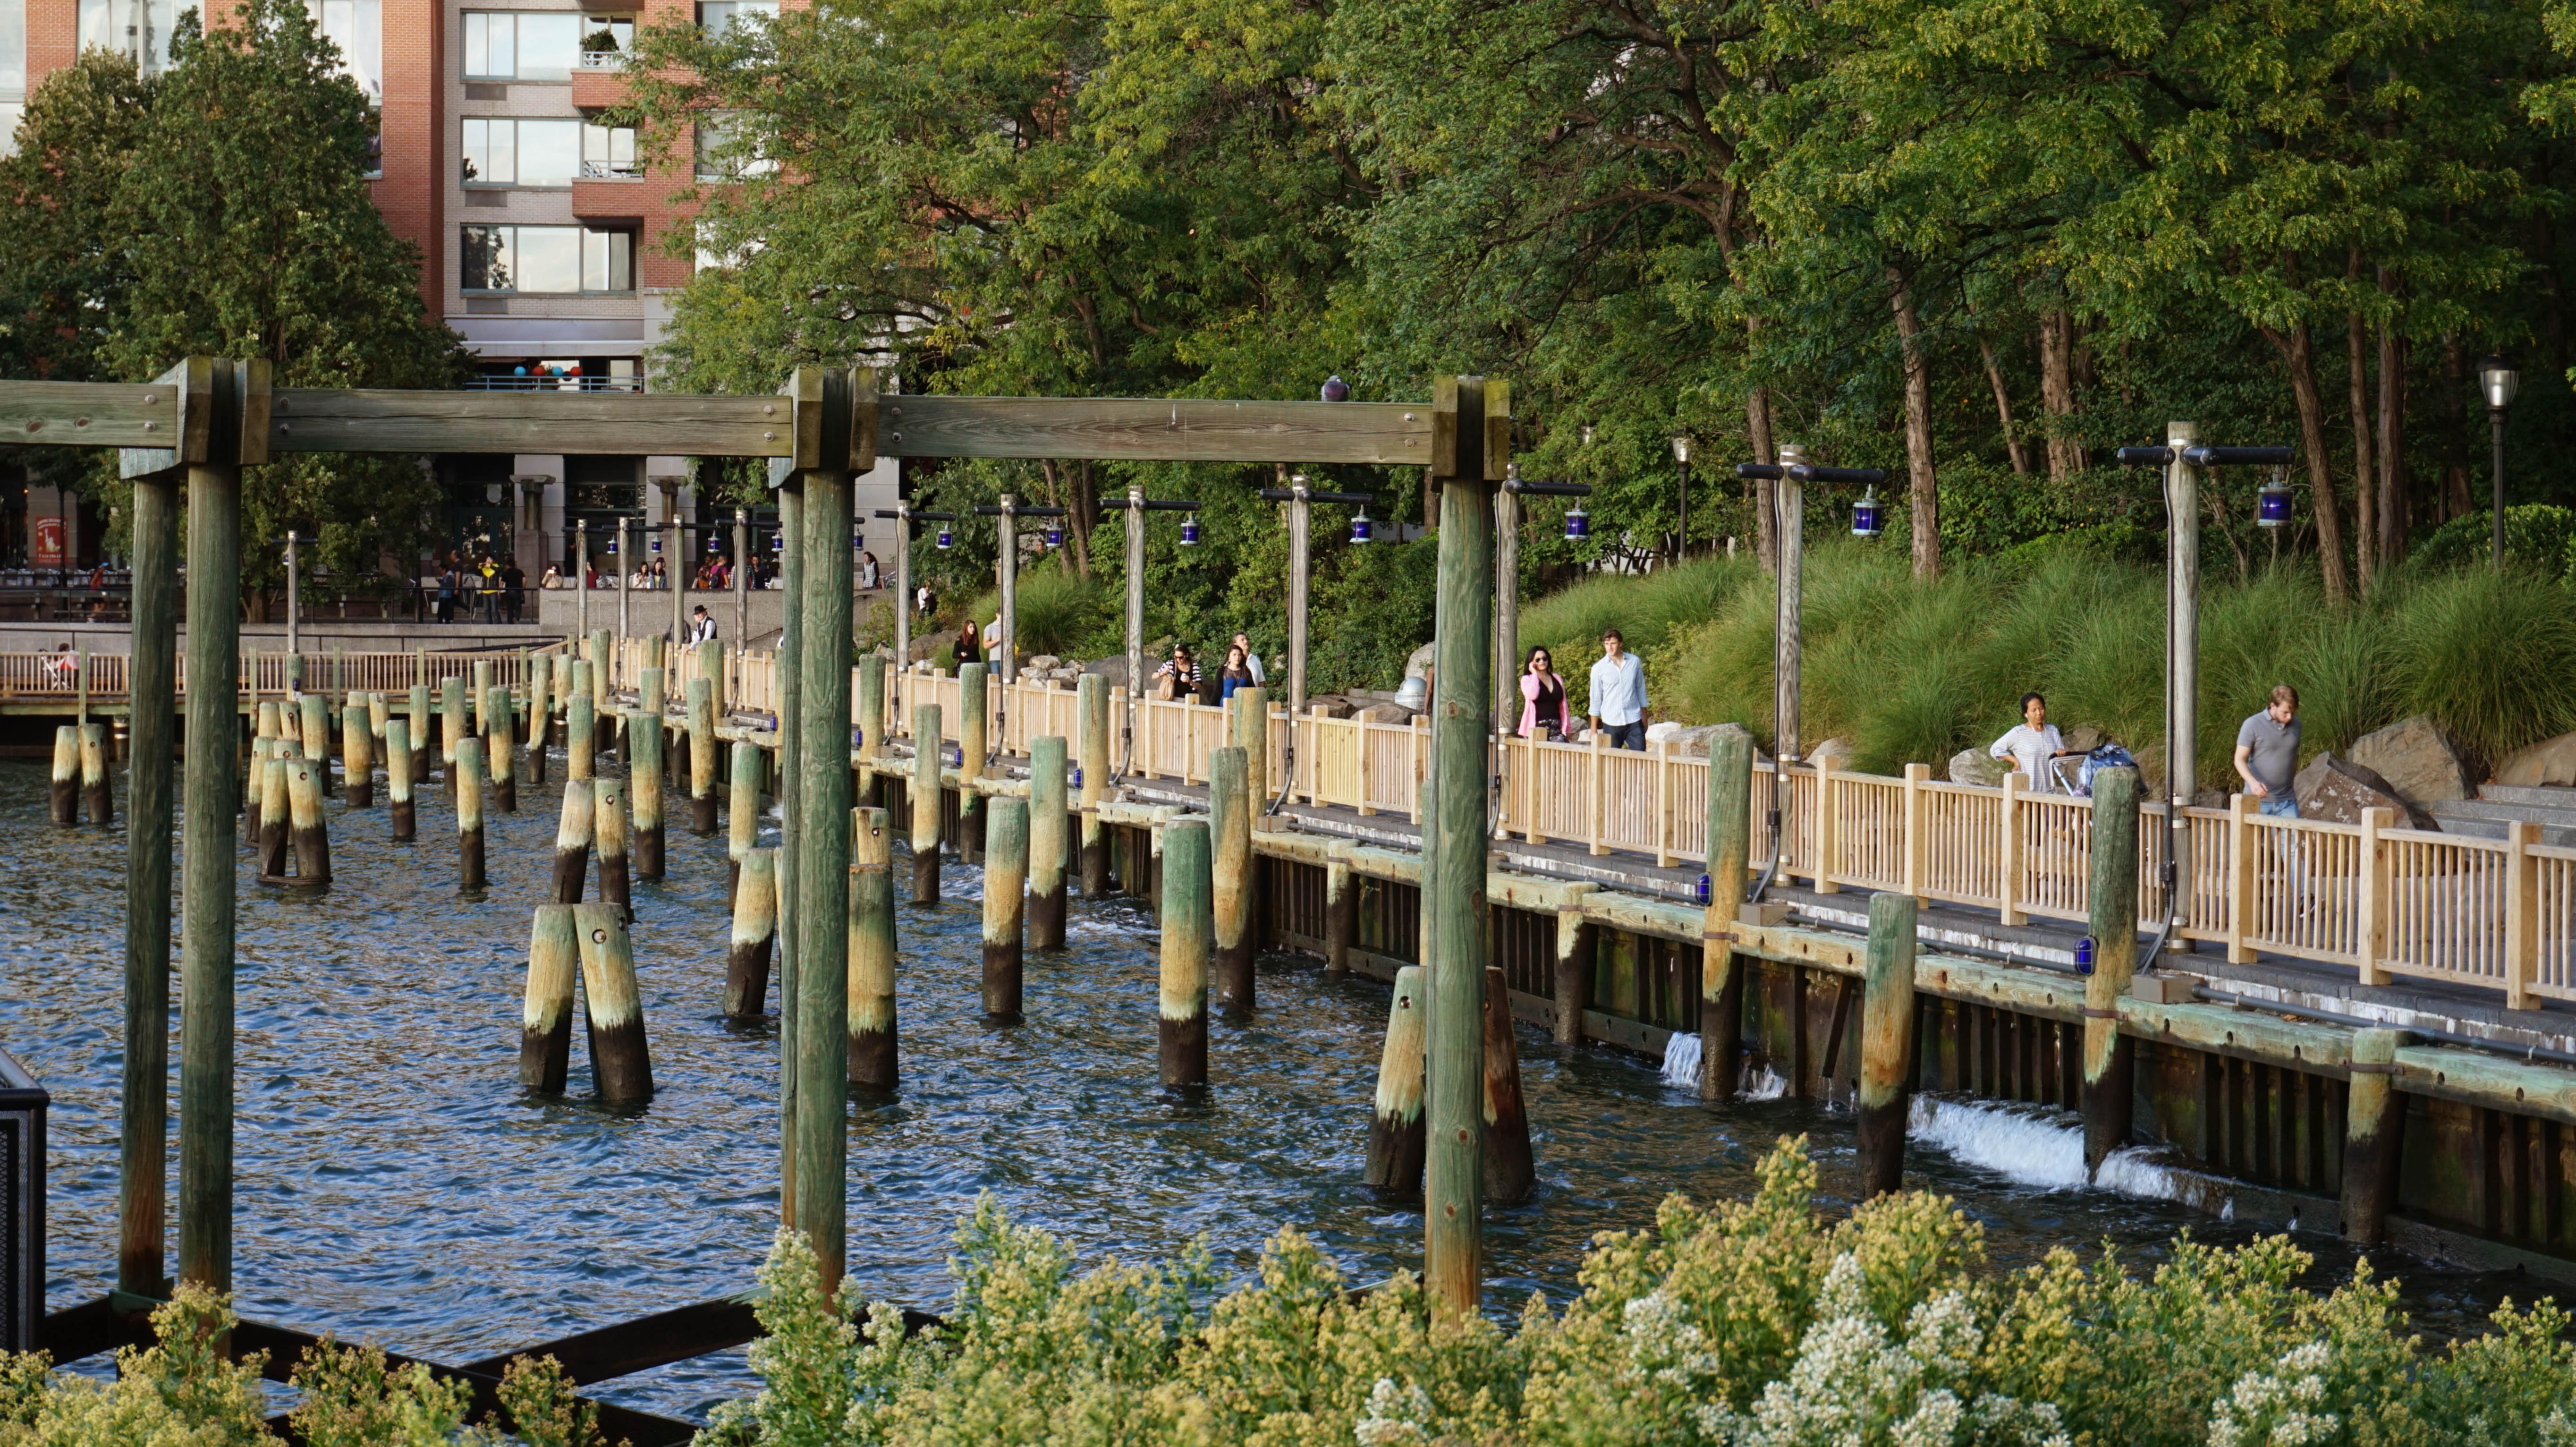 South-cove-esplanade-from-bridge-9-17-2014